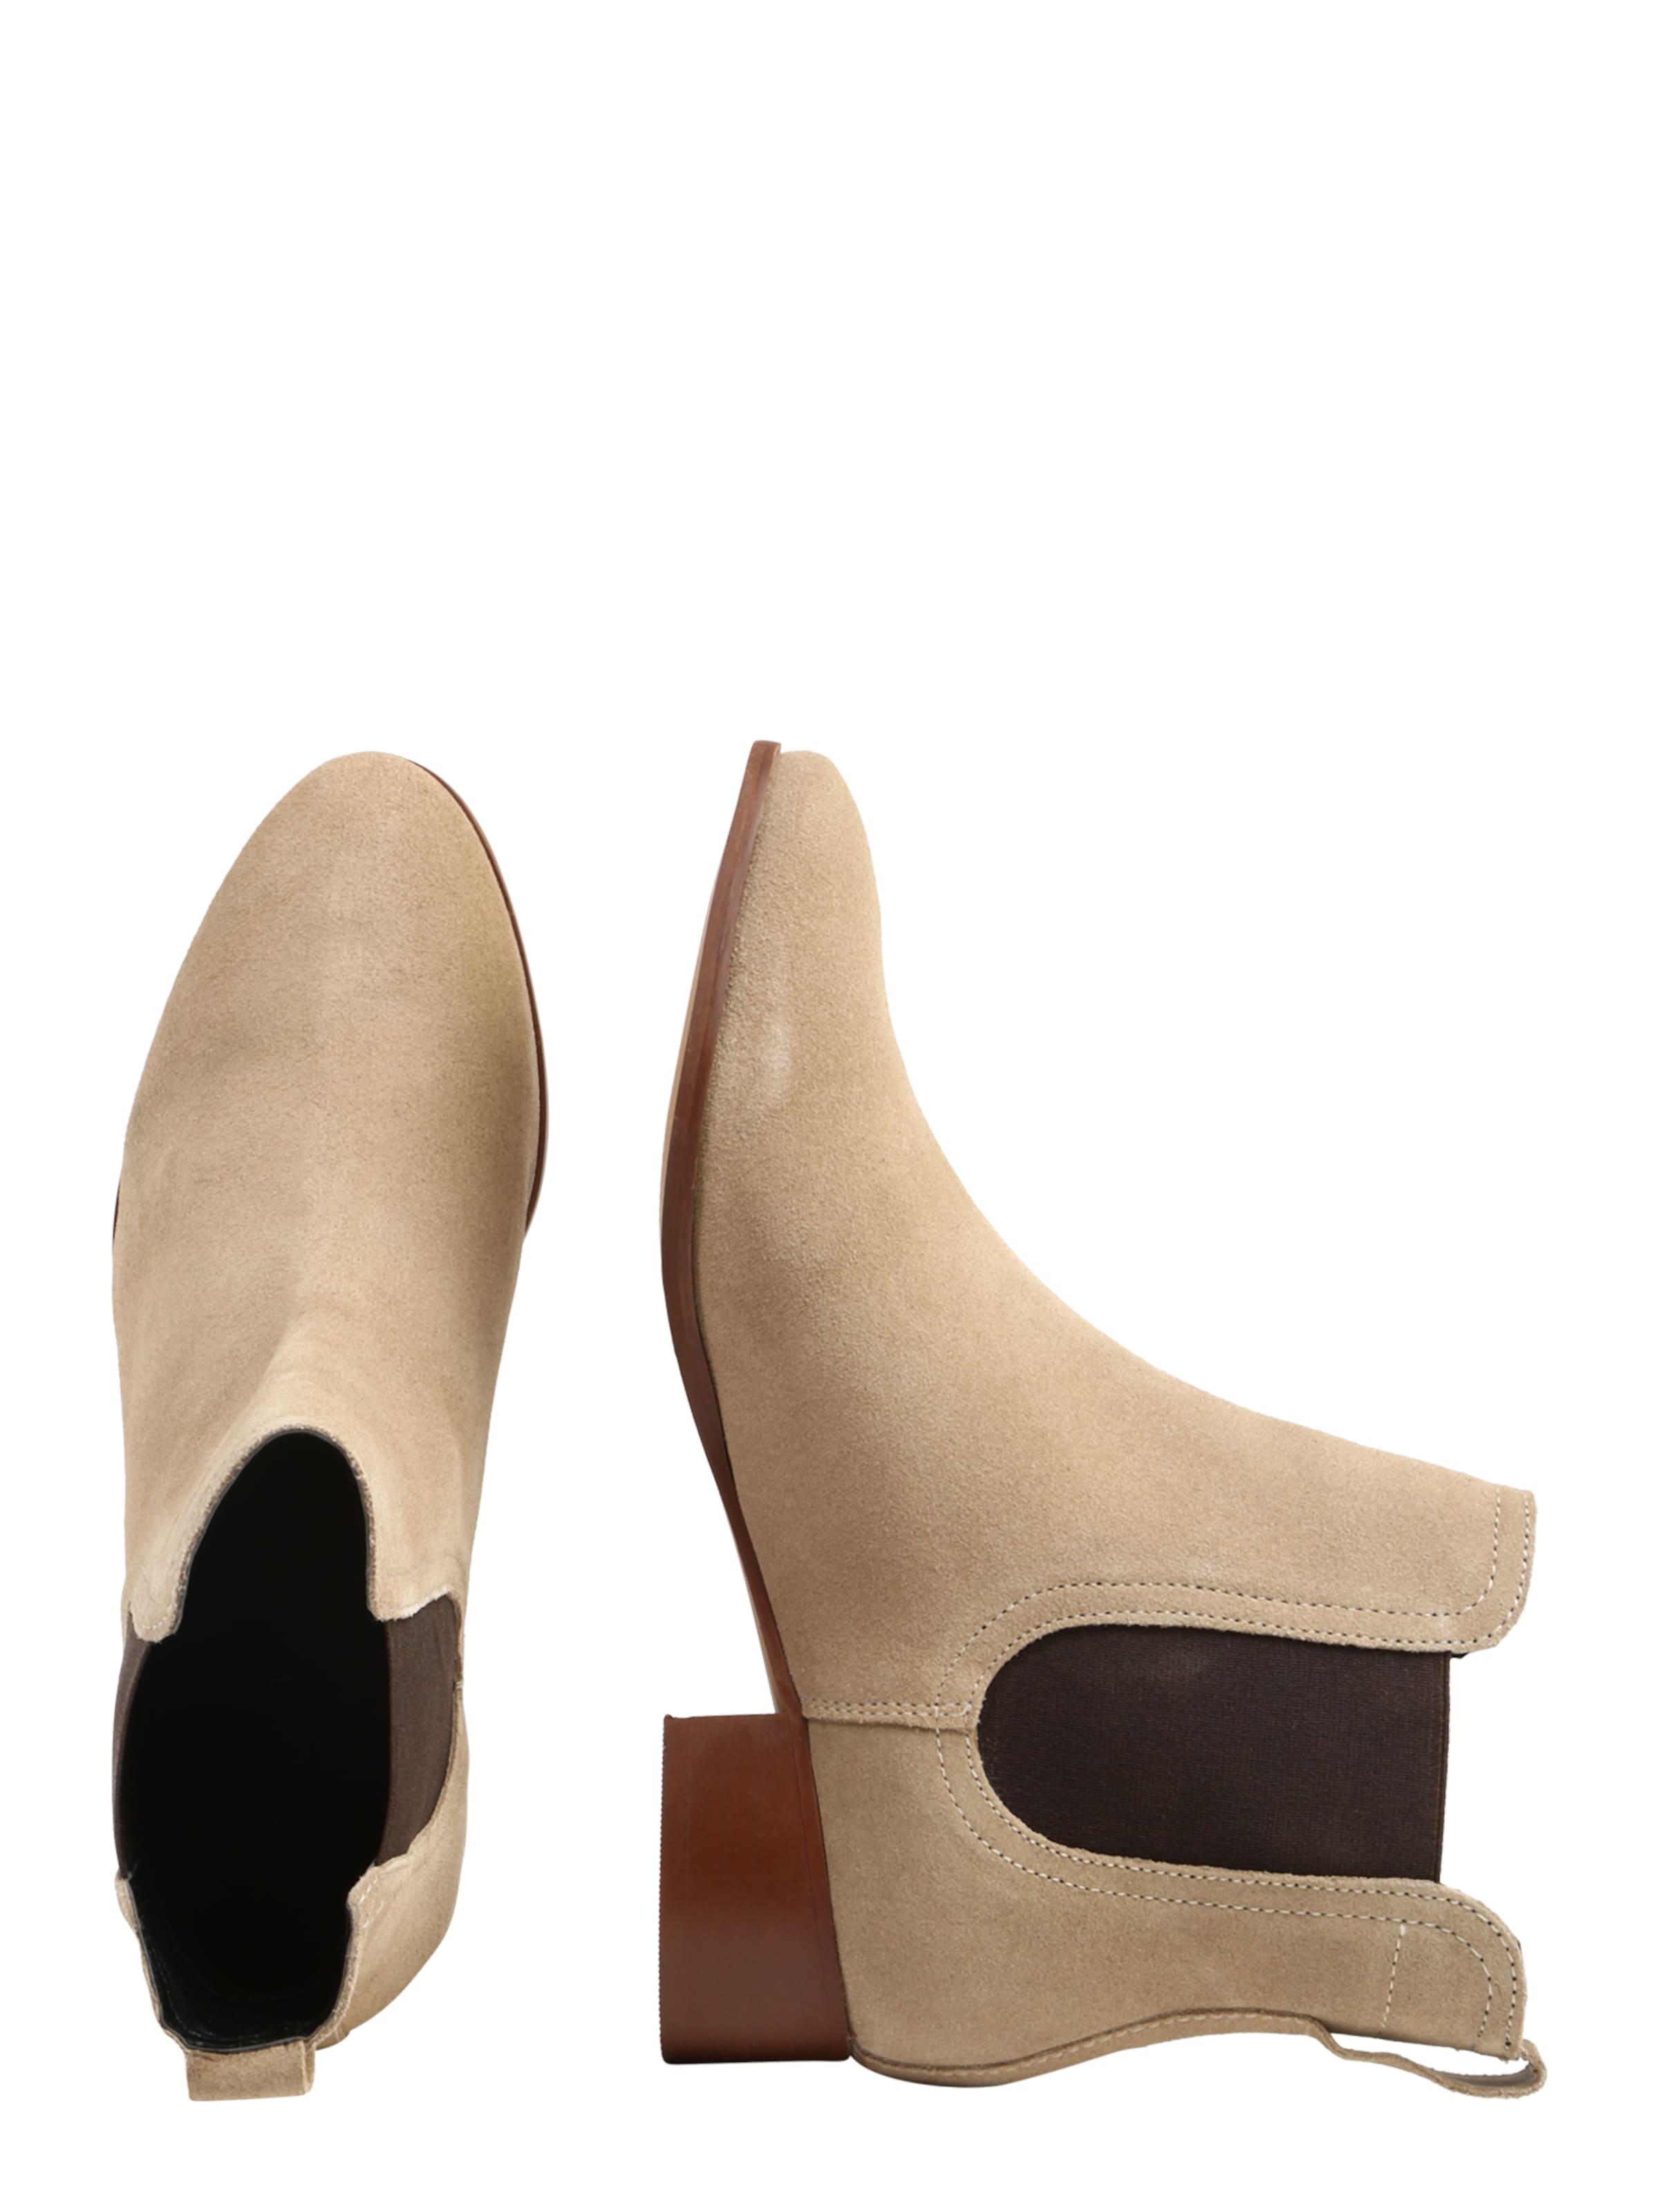 ' In Stiefelette Beige Ebles Formal Tg Esprit Shoes Bootie fm7yI6bvYg